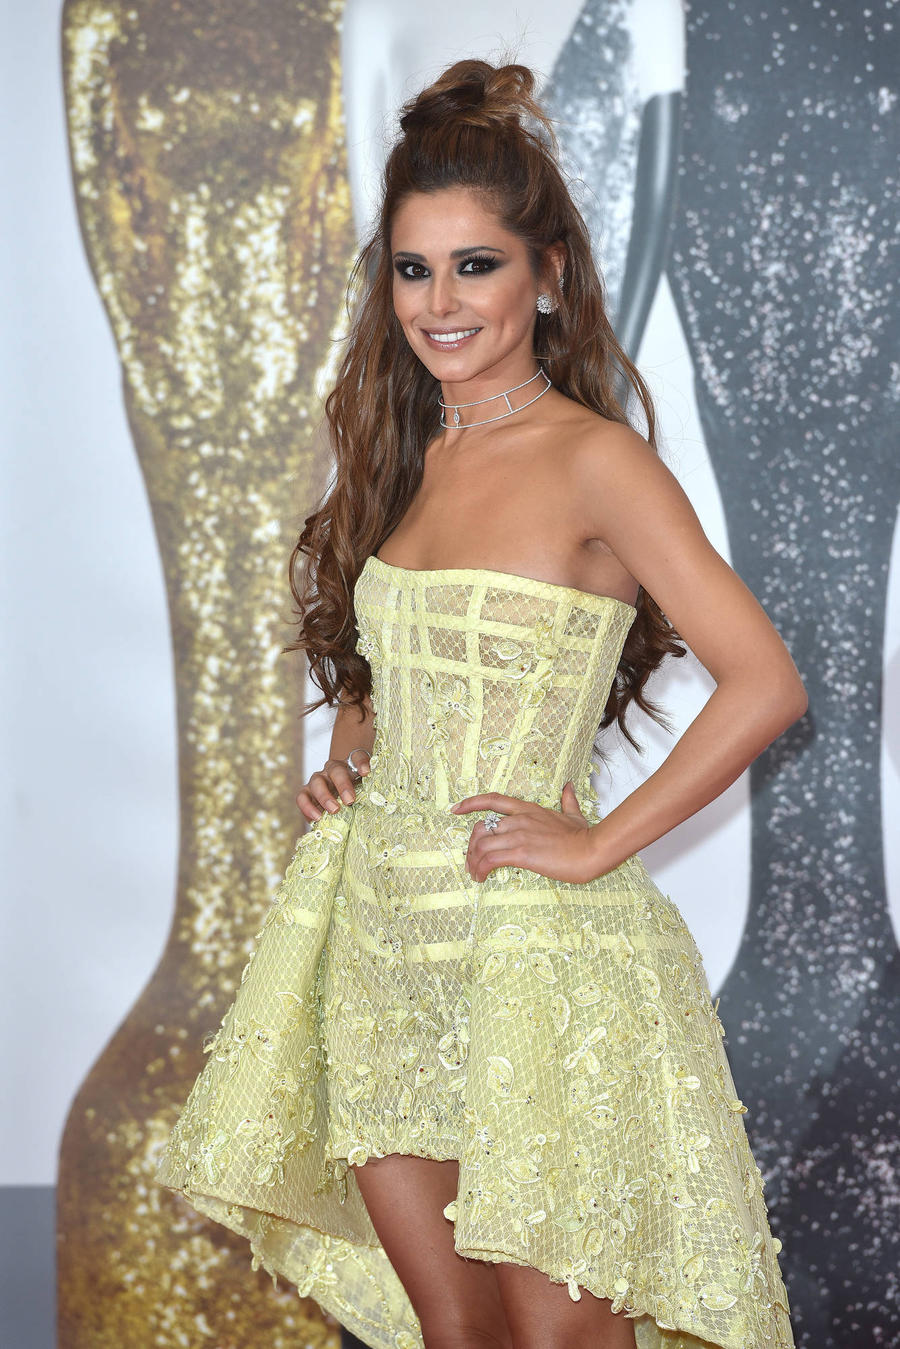 Cheryl Drops Fernandez-versini Surname Amid Divorce